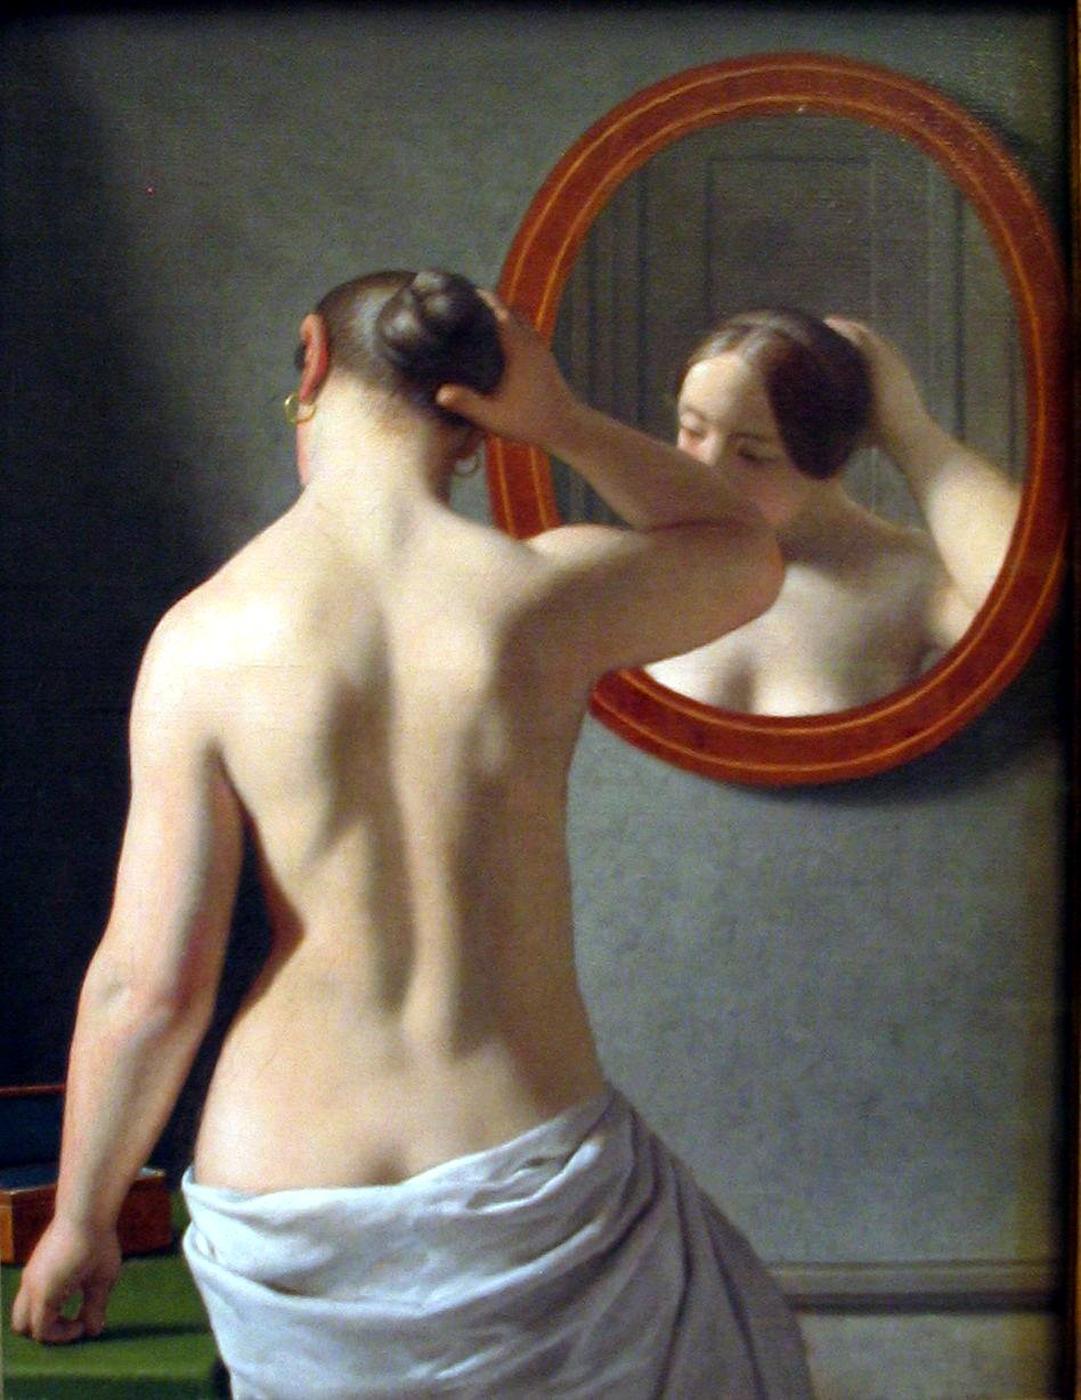 christoffer_wilhelm_eckersberg_3_woman_standing_in_front_of_a_mirror.jpg